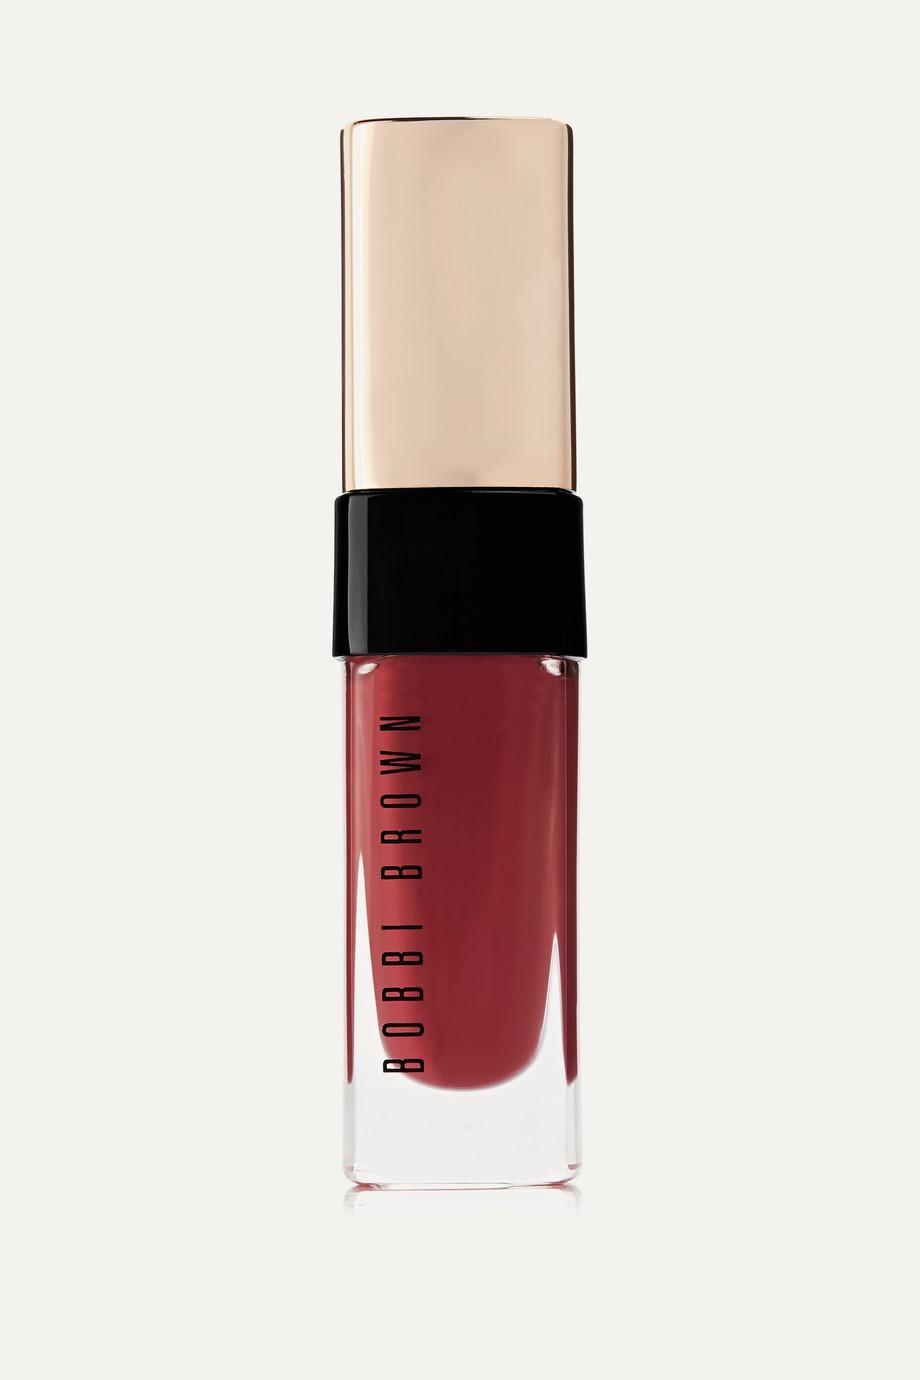 Bobbi Brown Luxe Liquid Lip High Shine - Italian Rose